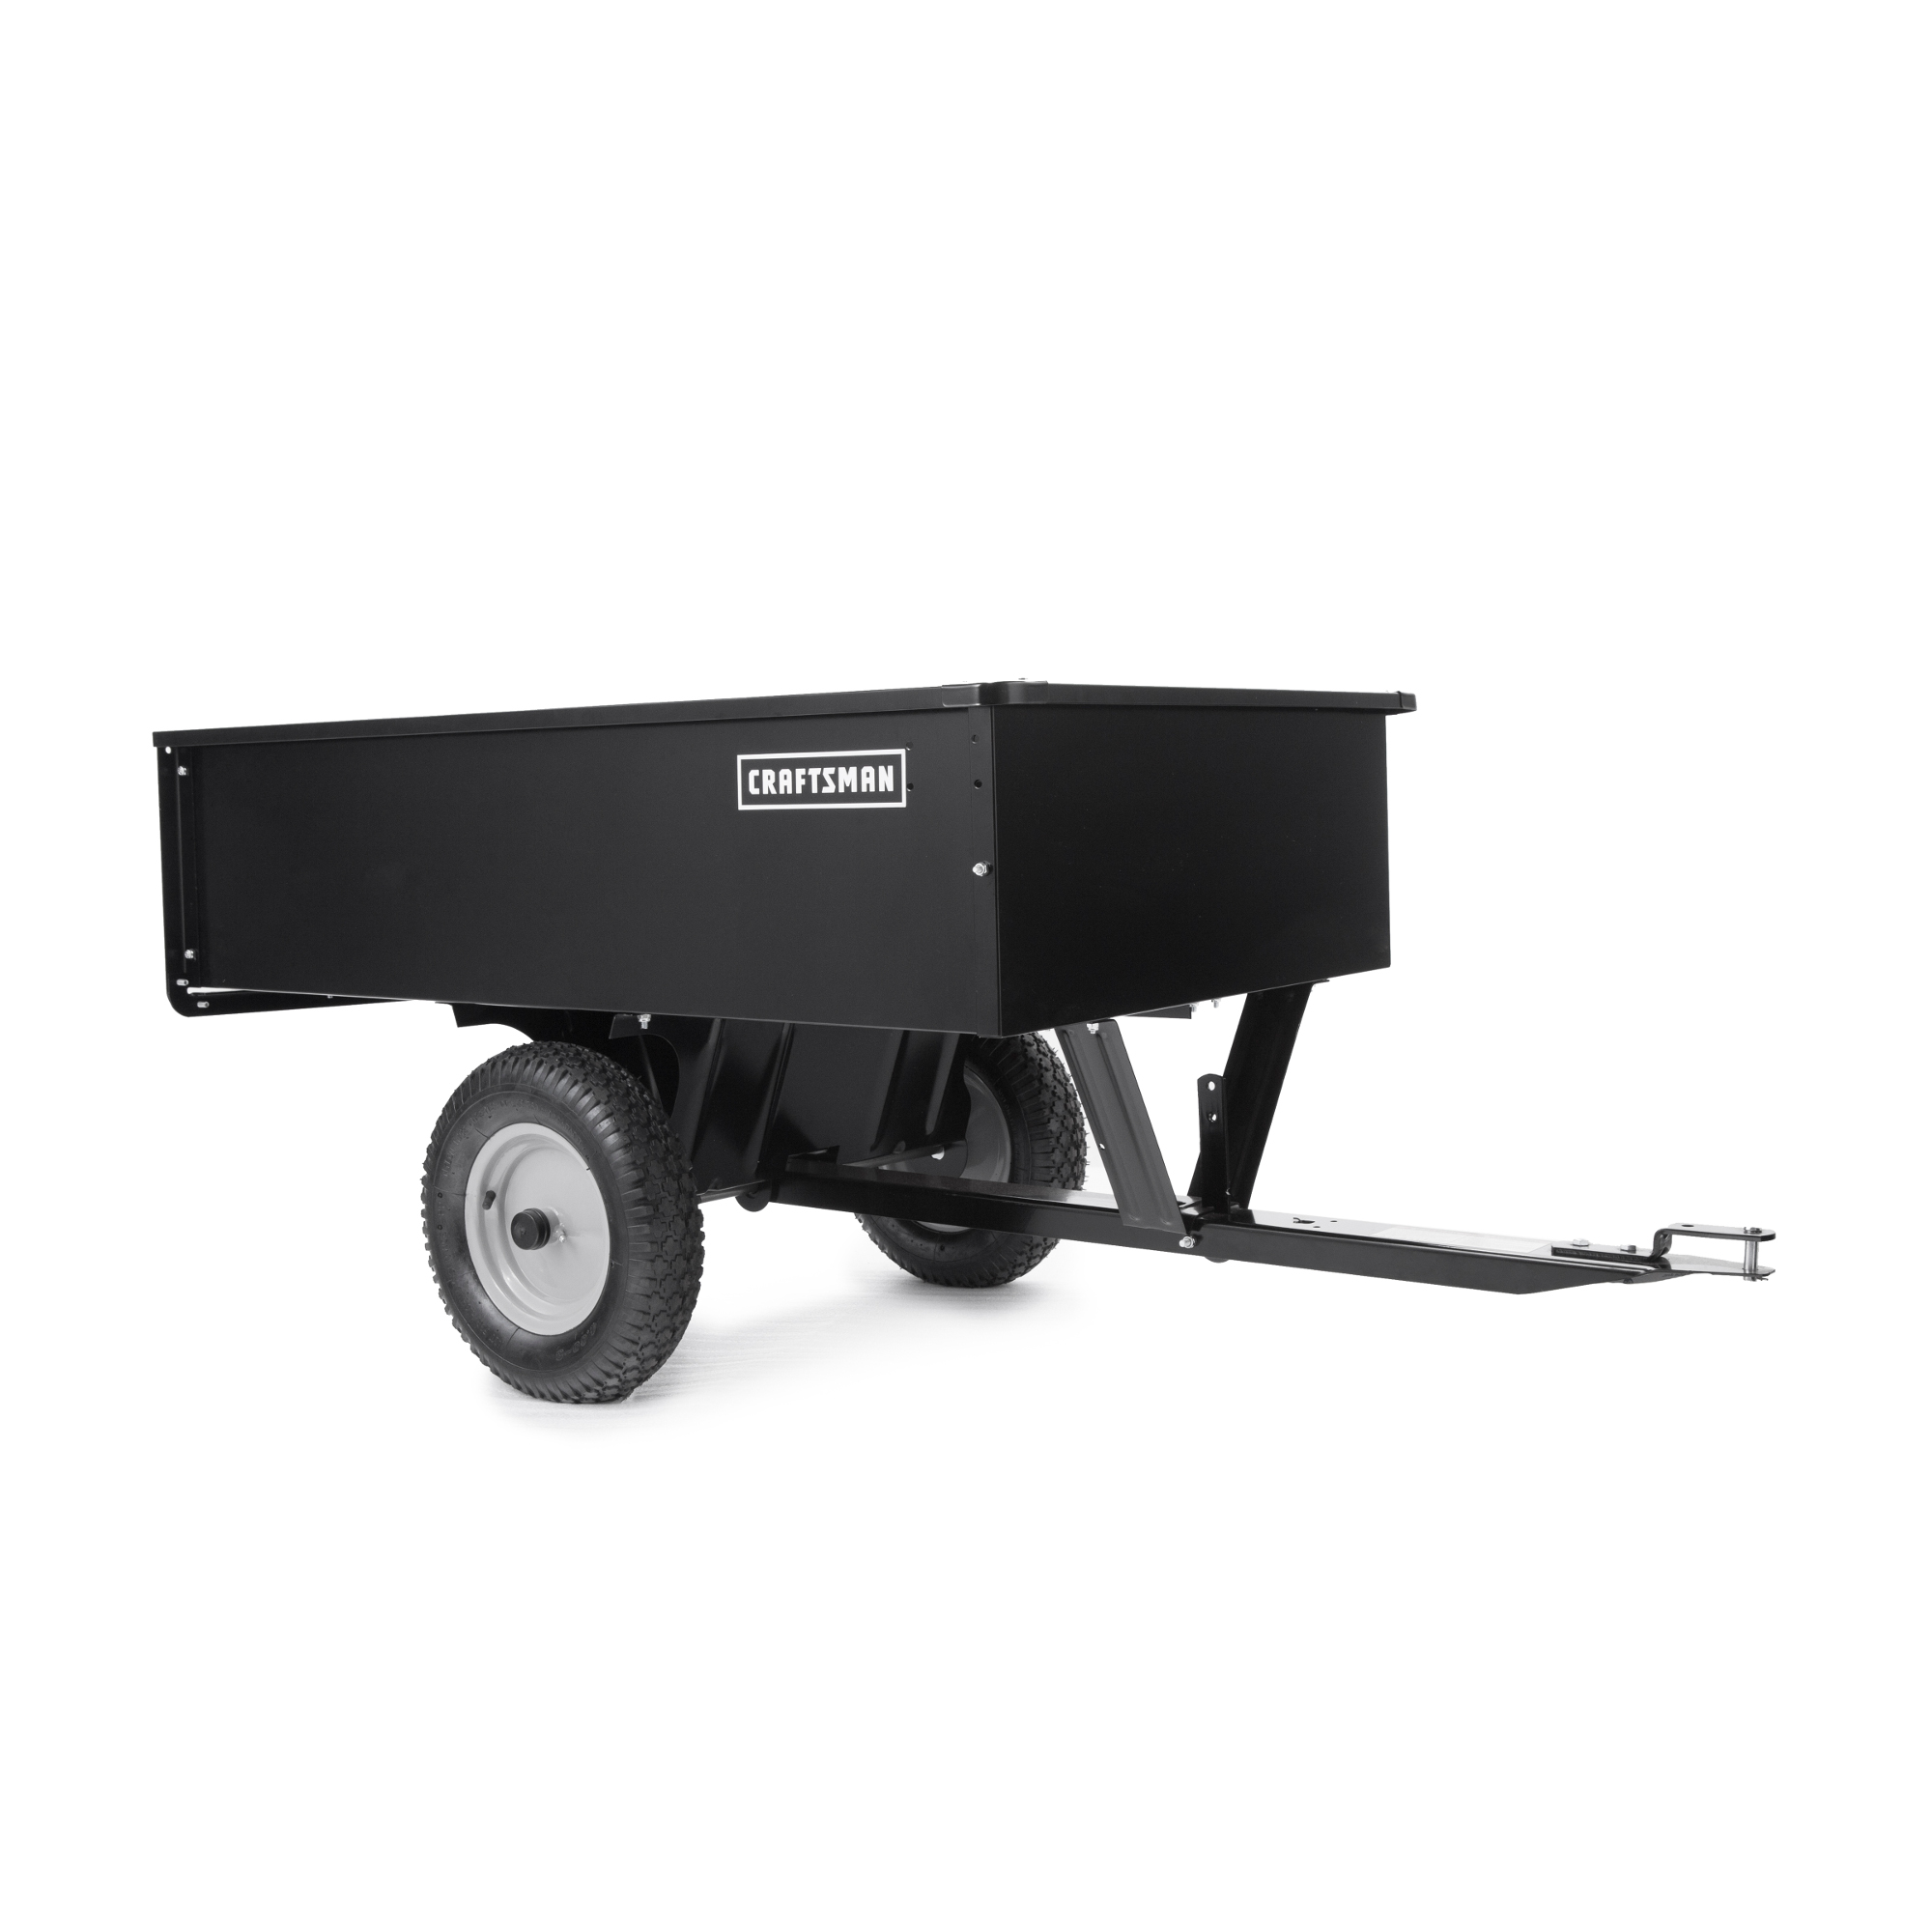 Craftsman 24355 12cu.ft. Steel Dump Cart, Black im test